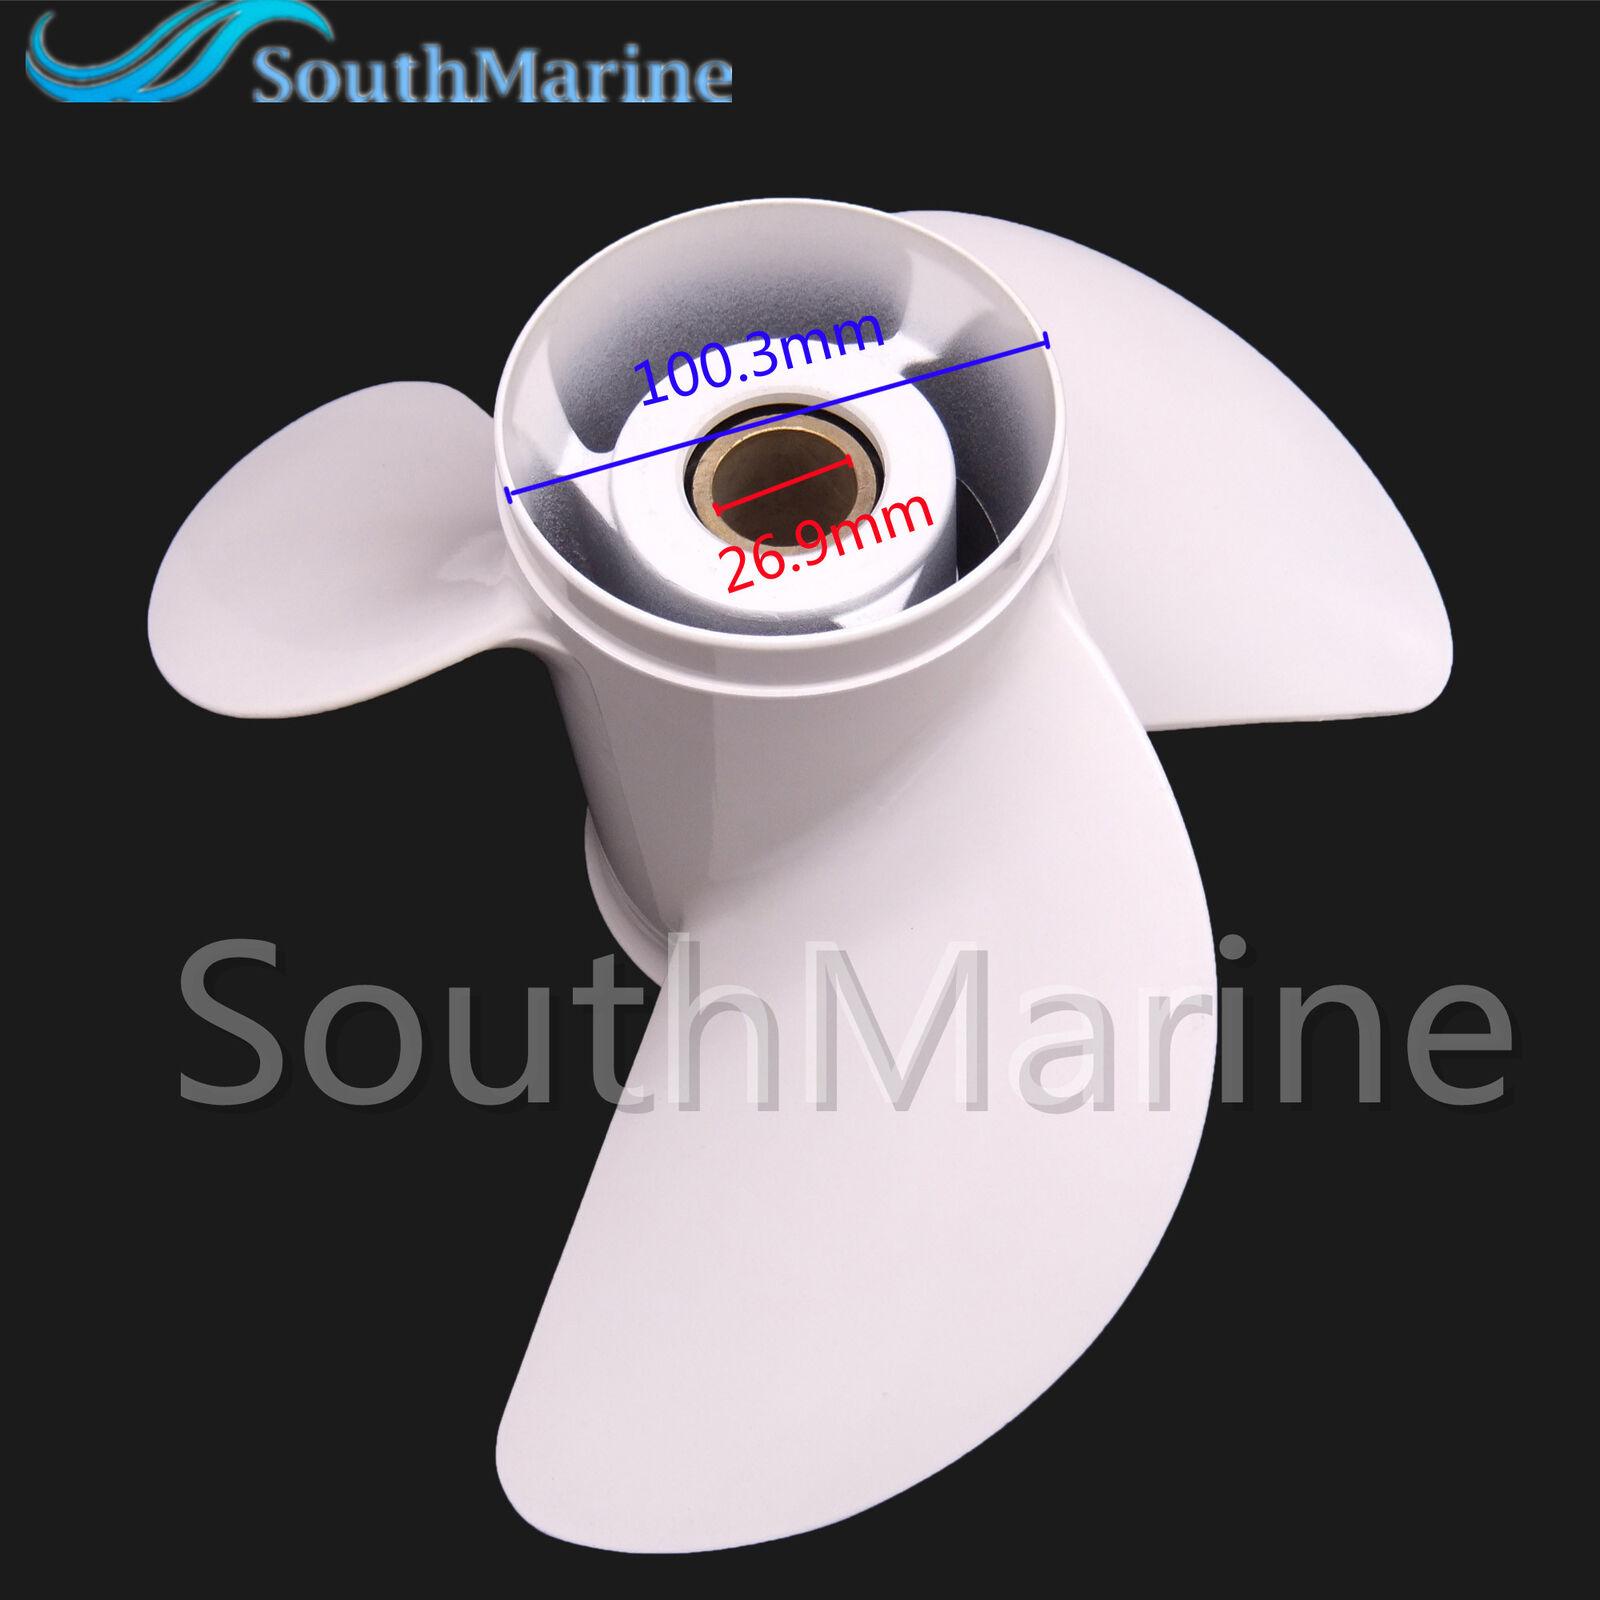 6E5-45947-00-EL Boat Motor Aluminum Alloy Propeller 13 1/2x15-K for Yamaha 60HP